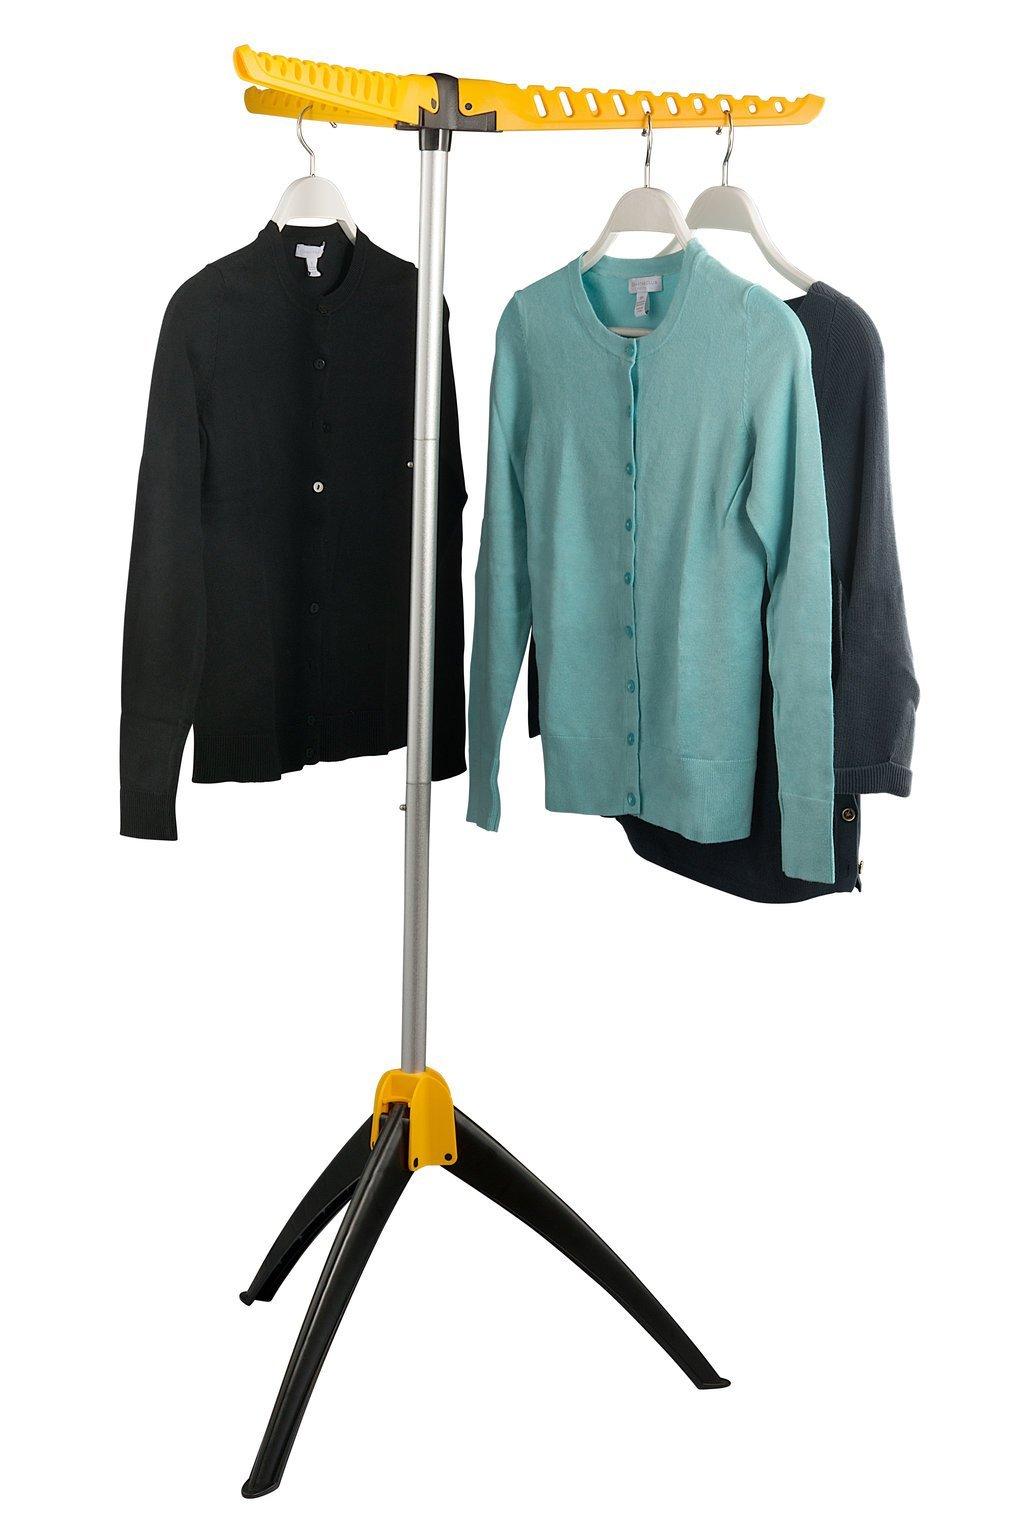 Saganizer Foldable Clothes Drying Rack